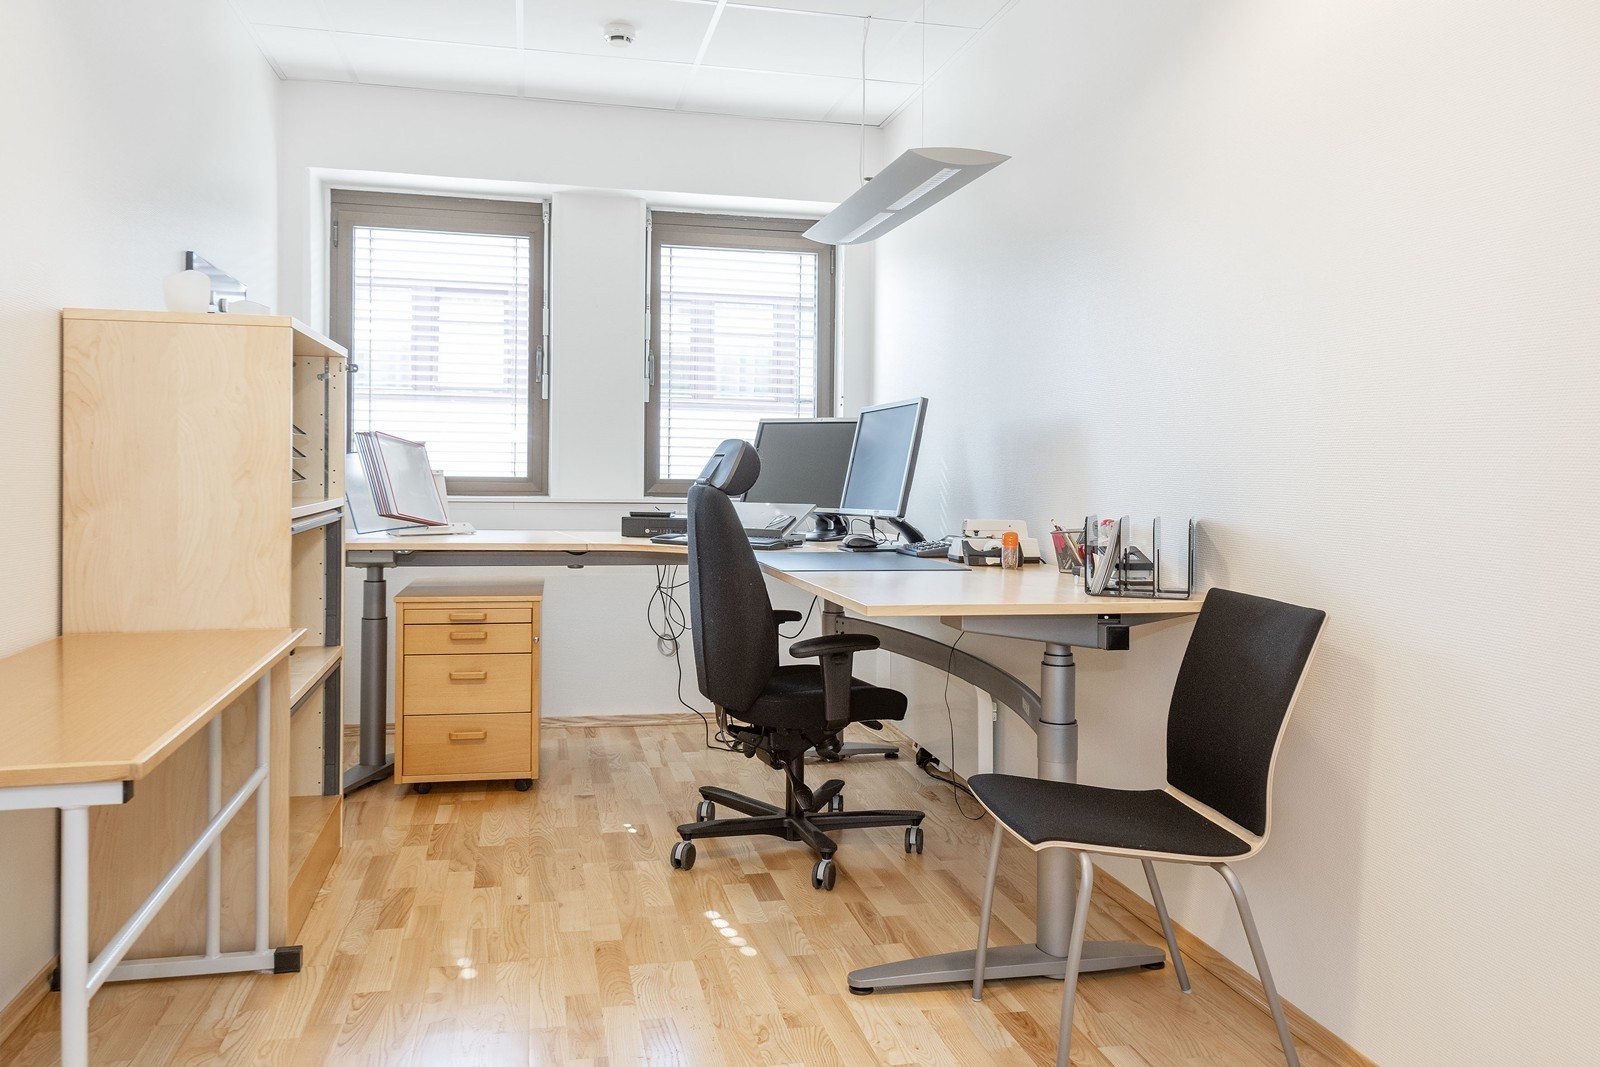 Lyse kontorer med gode lysforhold